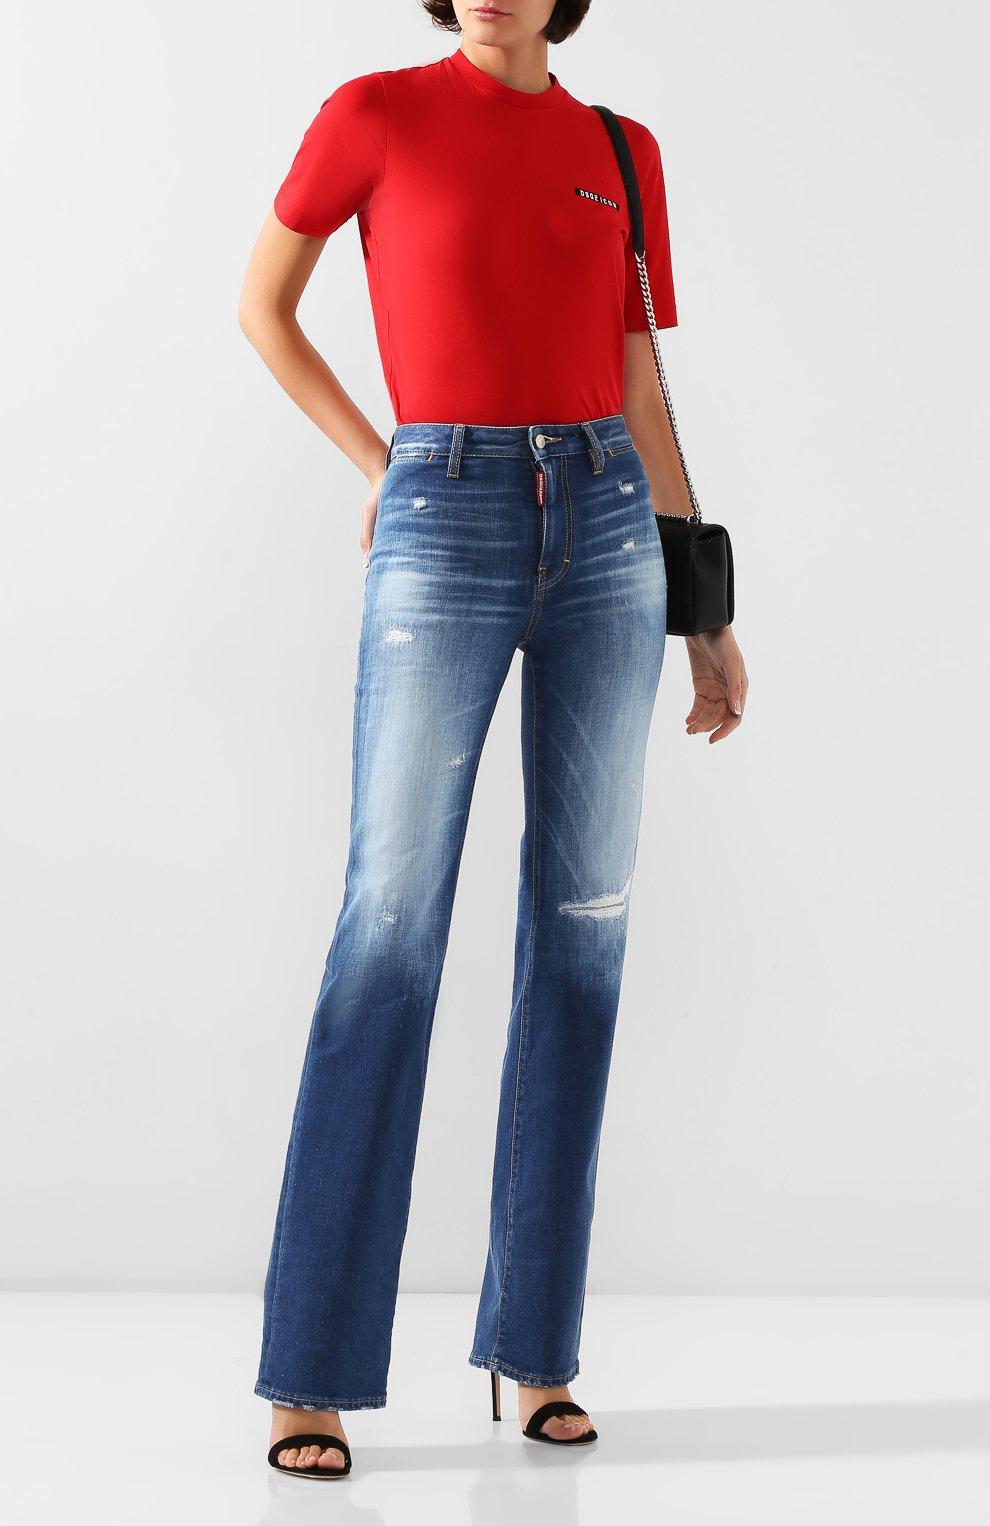 Женские джинсы DSQUARED2 синего цвета, арт. S75LB0314/S30663 | Фото 2